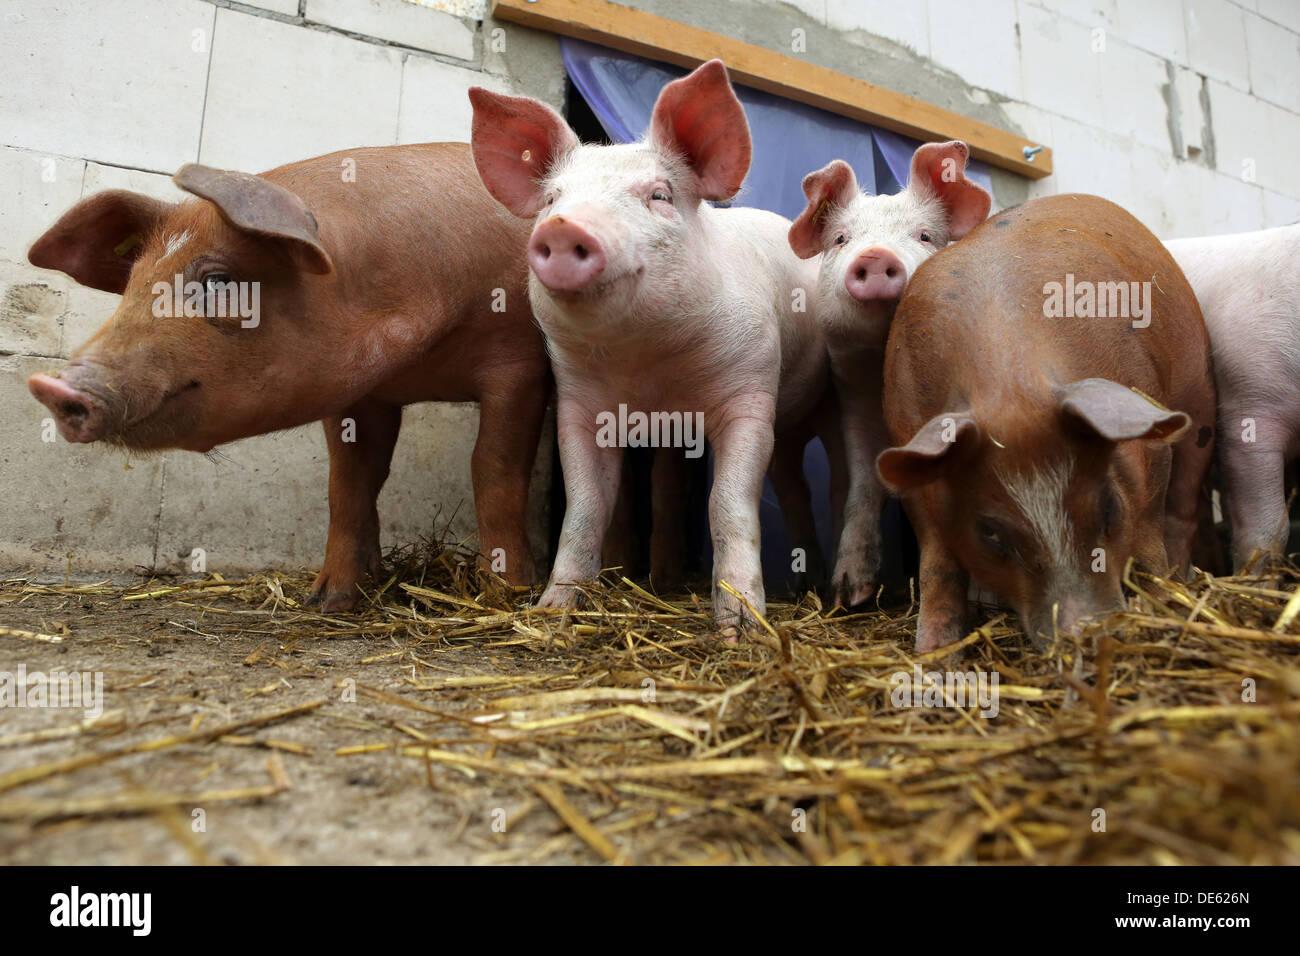 Resplendent village, Germany, Bentheim Black Pied Hogs and pigs - Stock Image